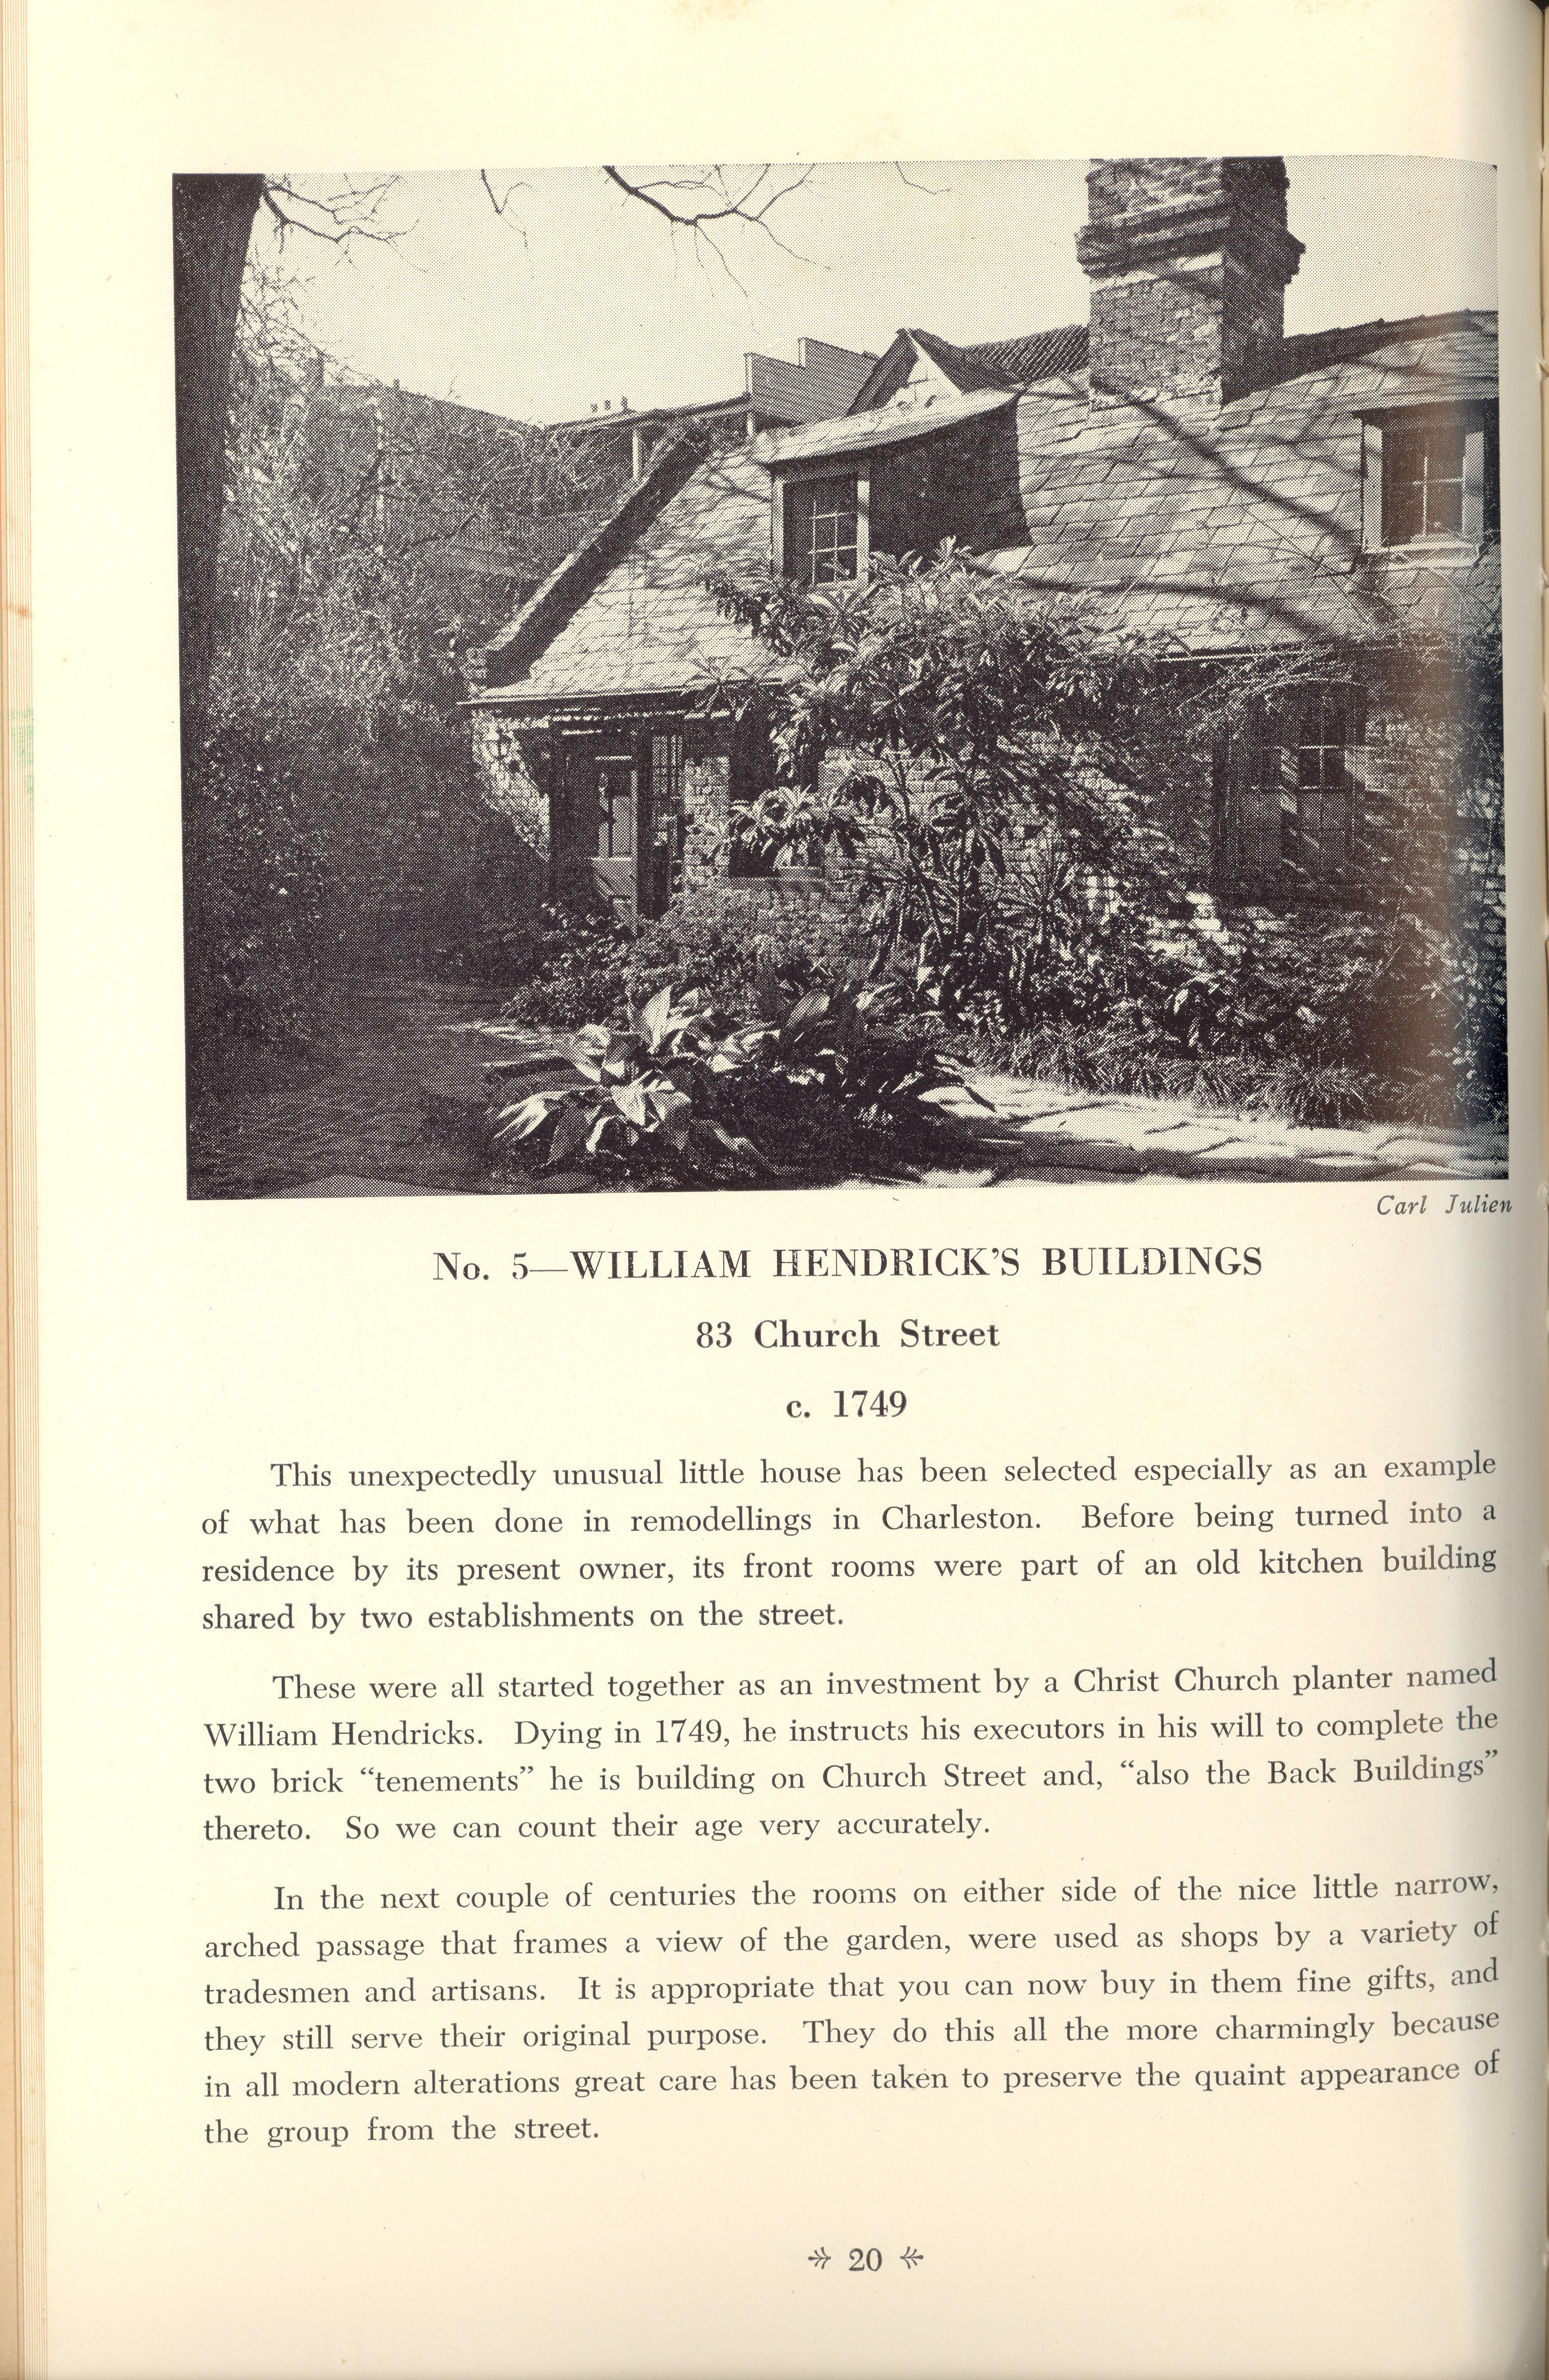 Page 20:  No. 5 - William Hendricks' Buildings, 83 Church Street, c. 1749